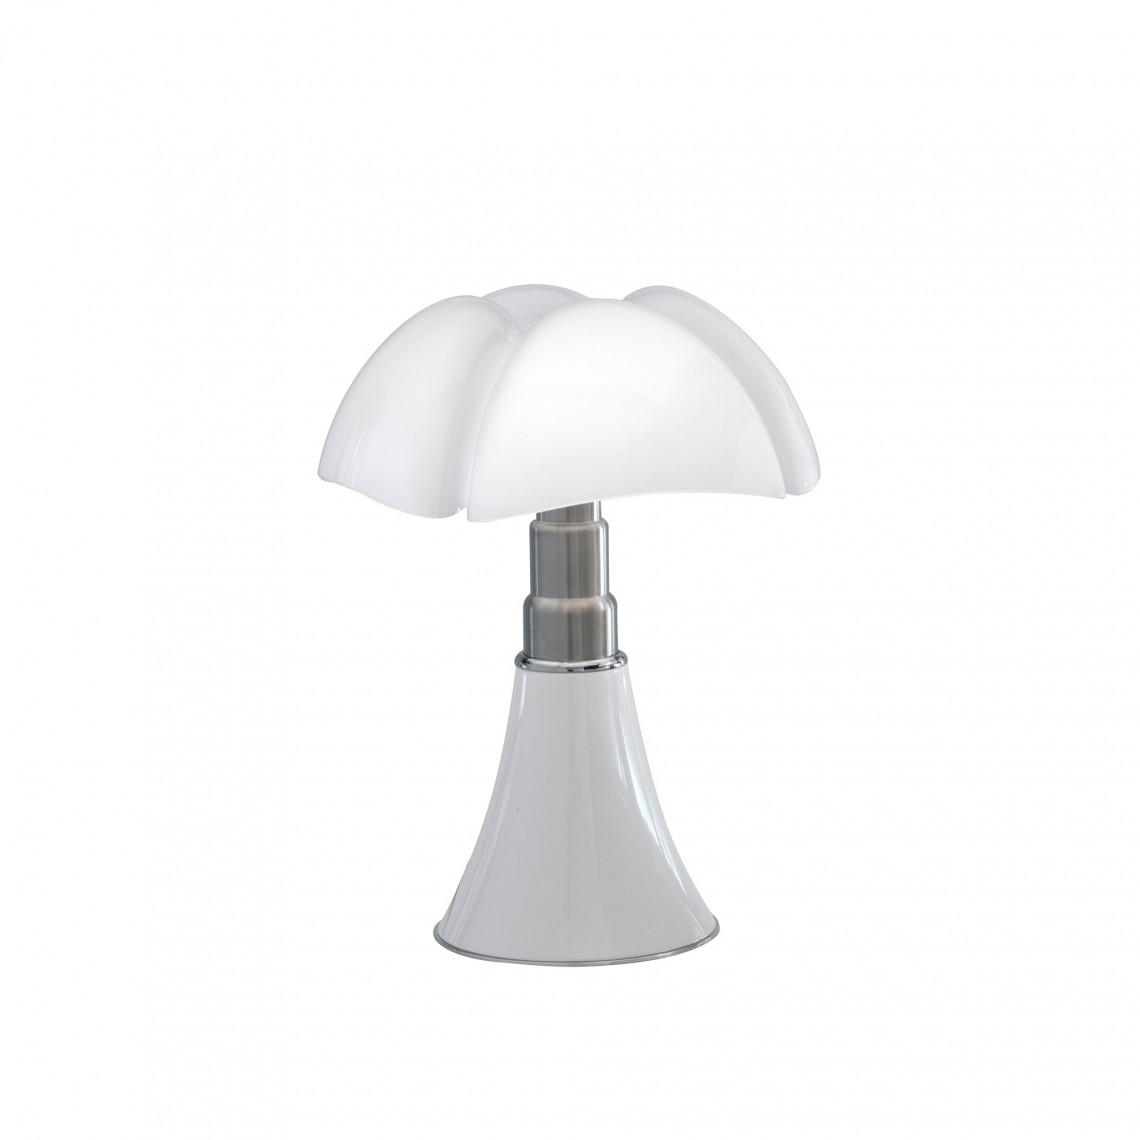 Minipipistrello Cordless Table Lamp White